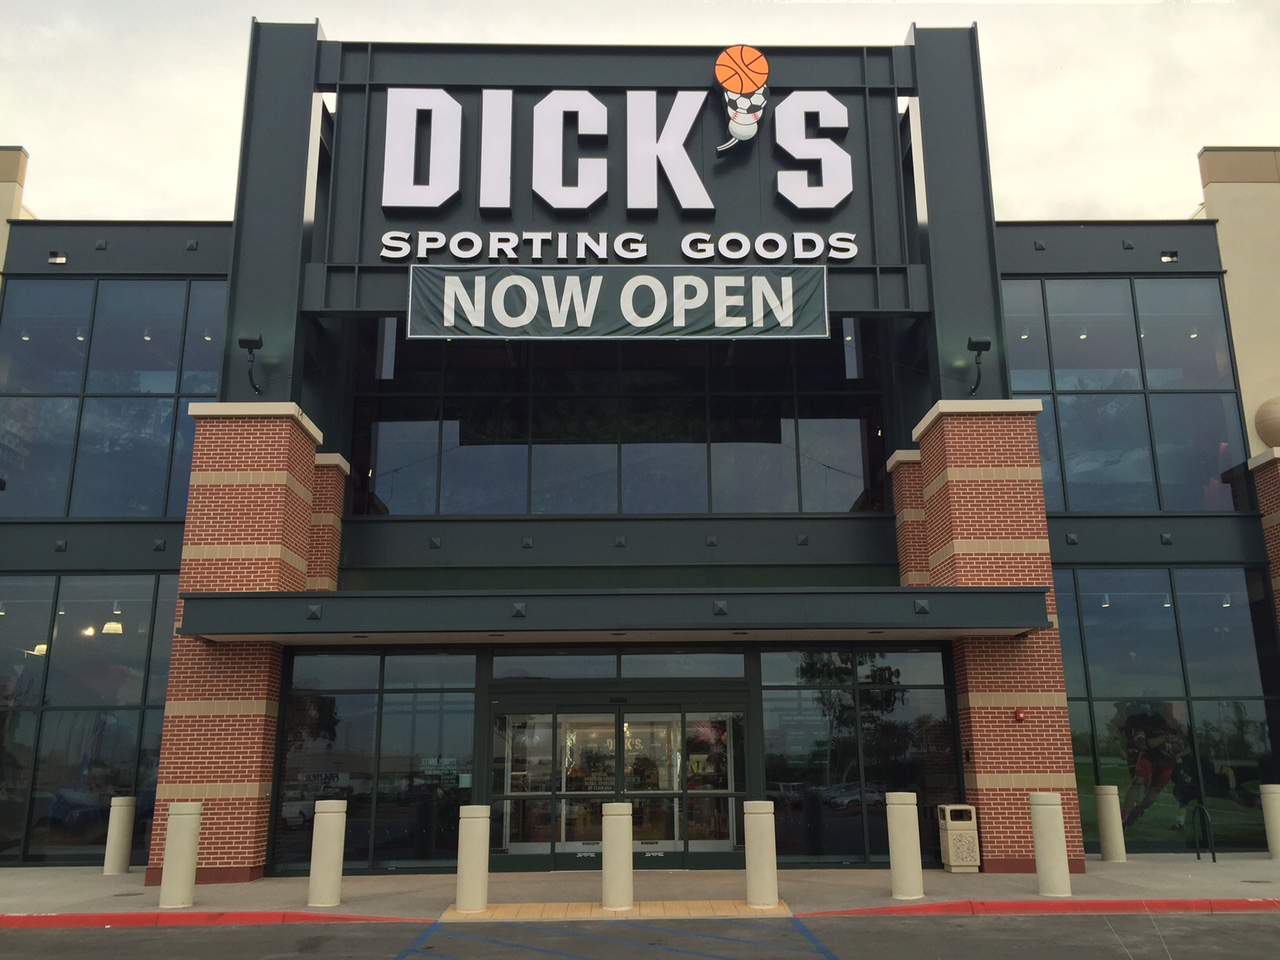 Store front of DICK'S Sporting Goods store in Cerritos, CA